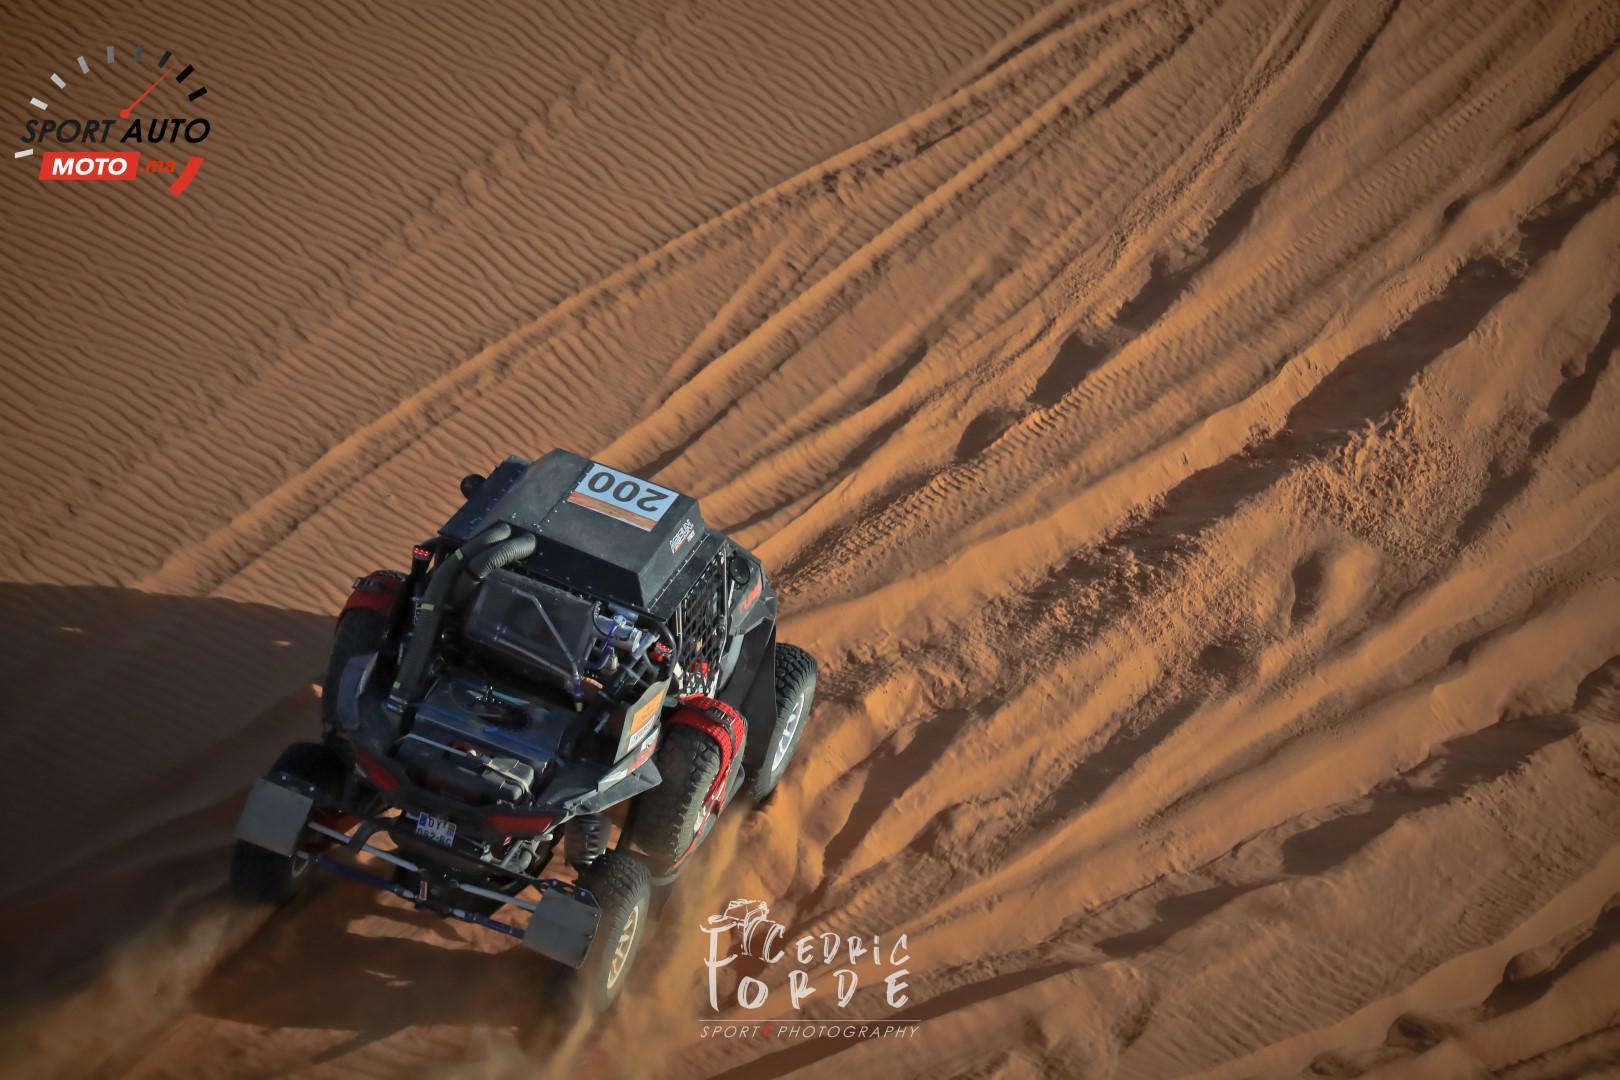 hearts-of-morocco-2018-cherednikov-et-engel-vainqueurs-sur-les-dunes-898-7.jpg